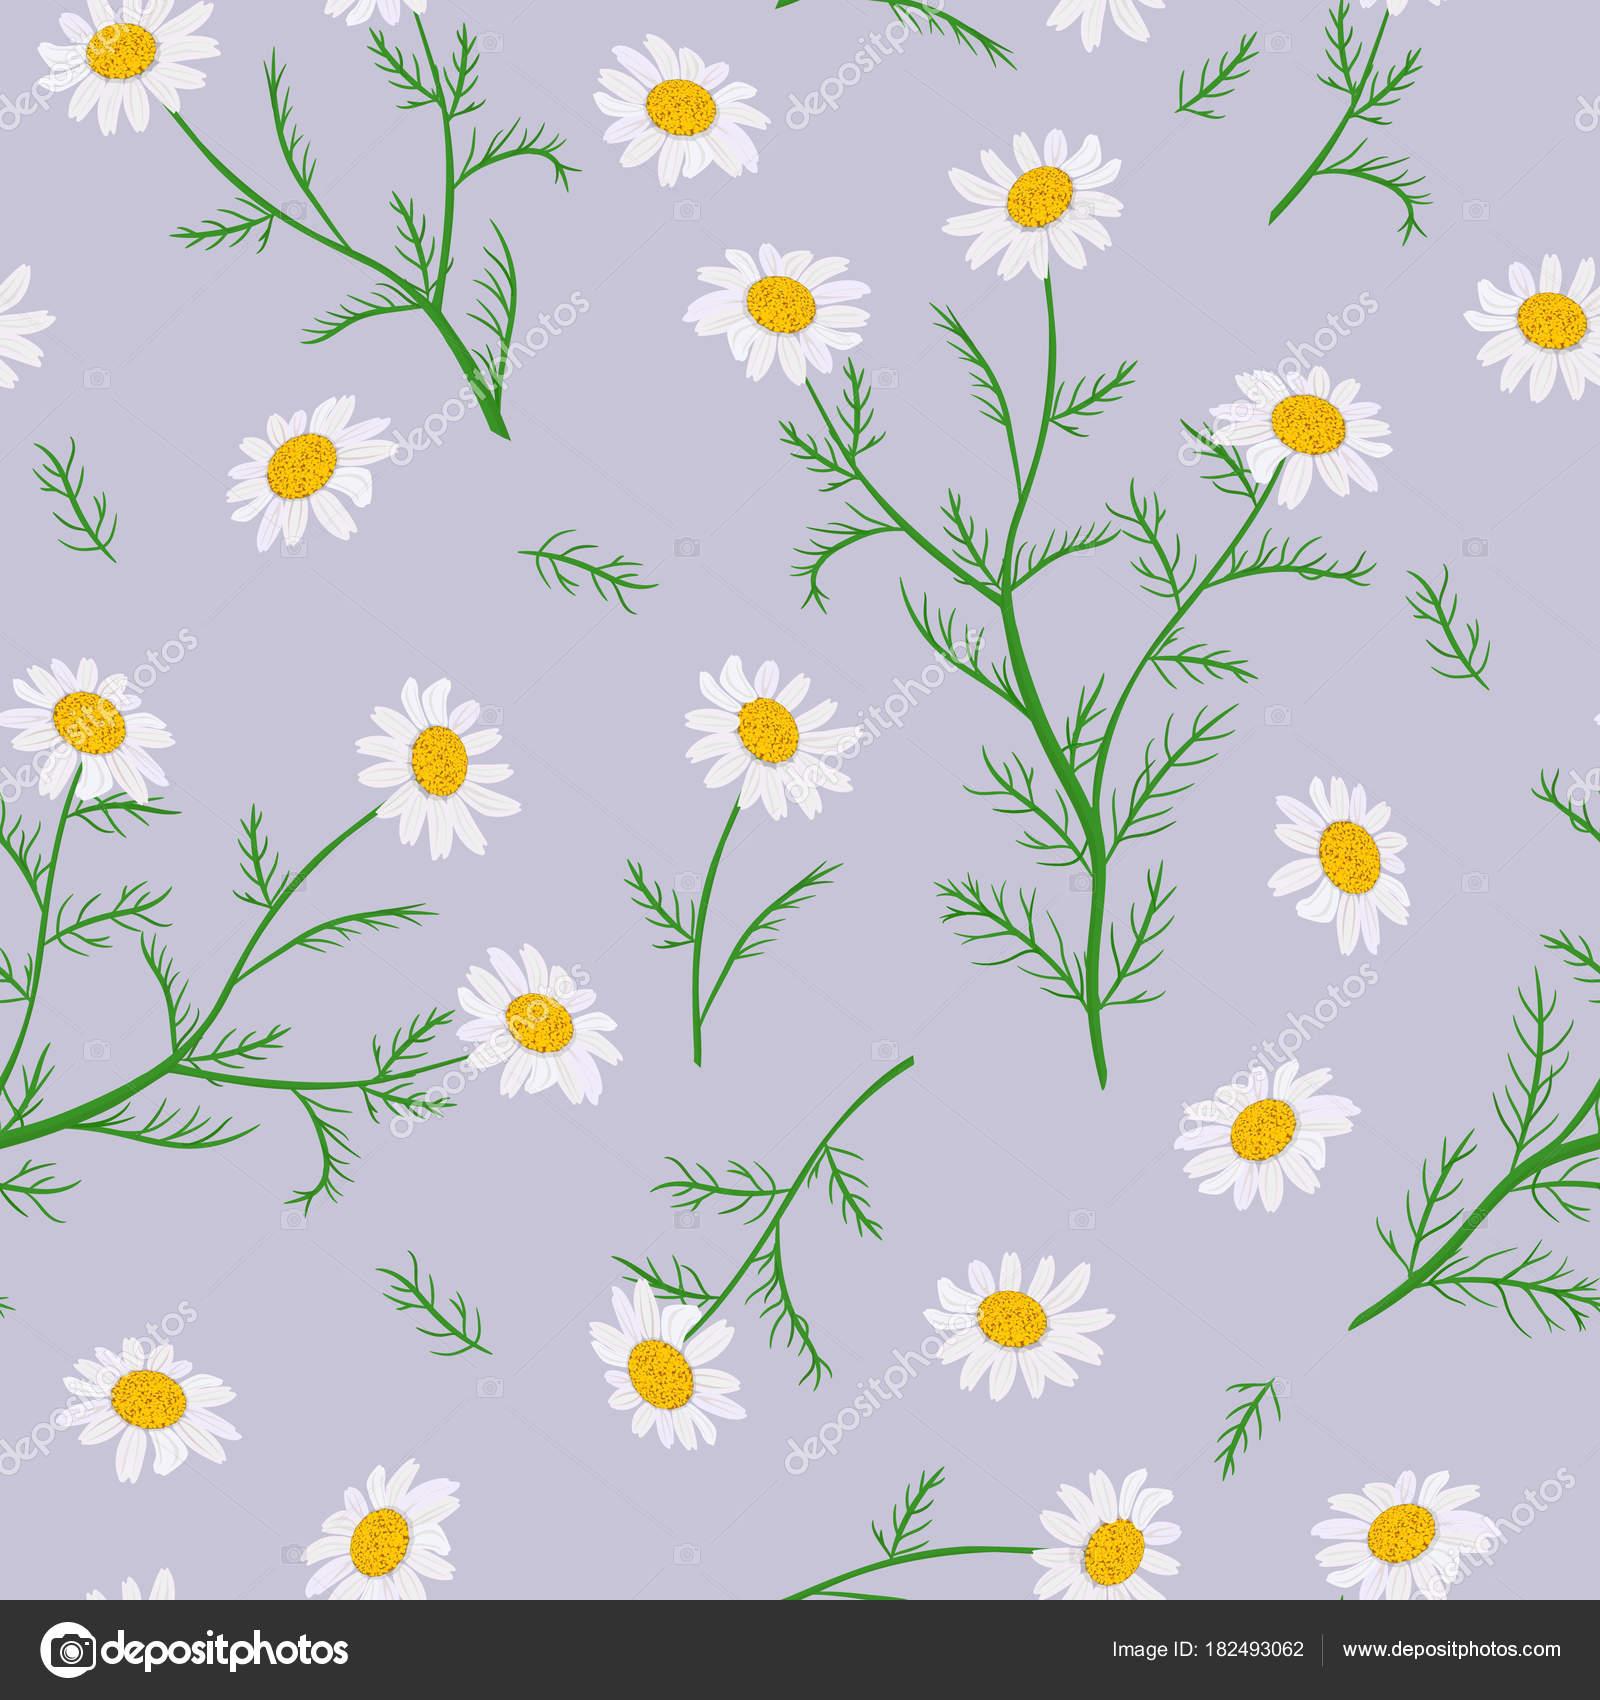 Daisy Flowers Seamless Pattern Vector Illustration Stock Vector